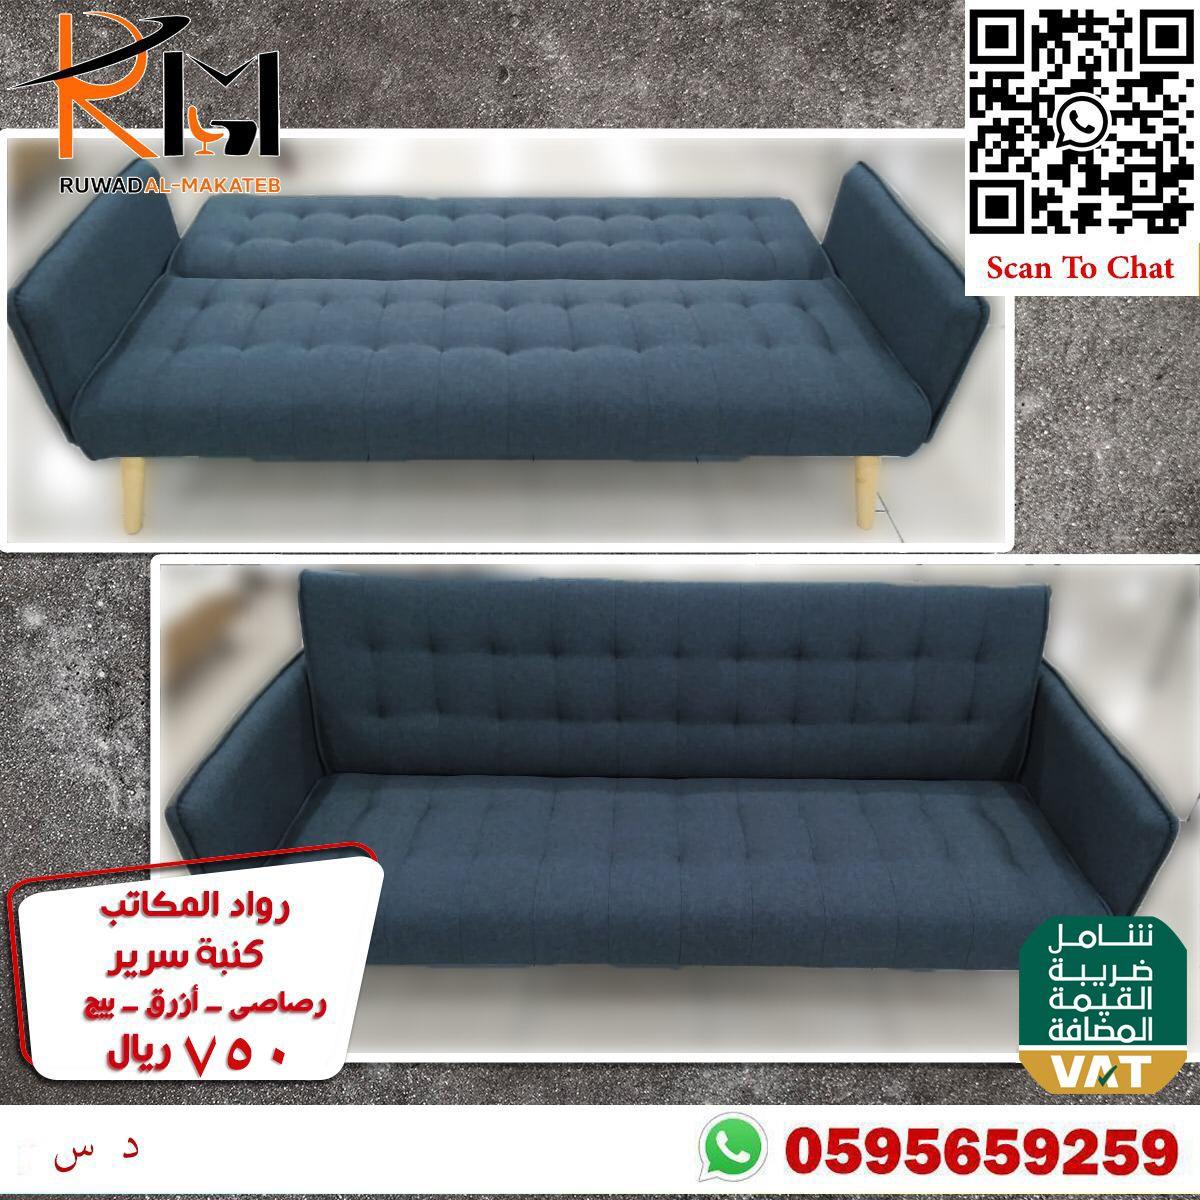 كنب سرير أزرق In 2021 Furniture Sofa Home Decor